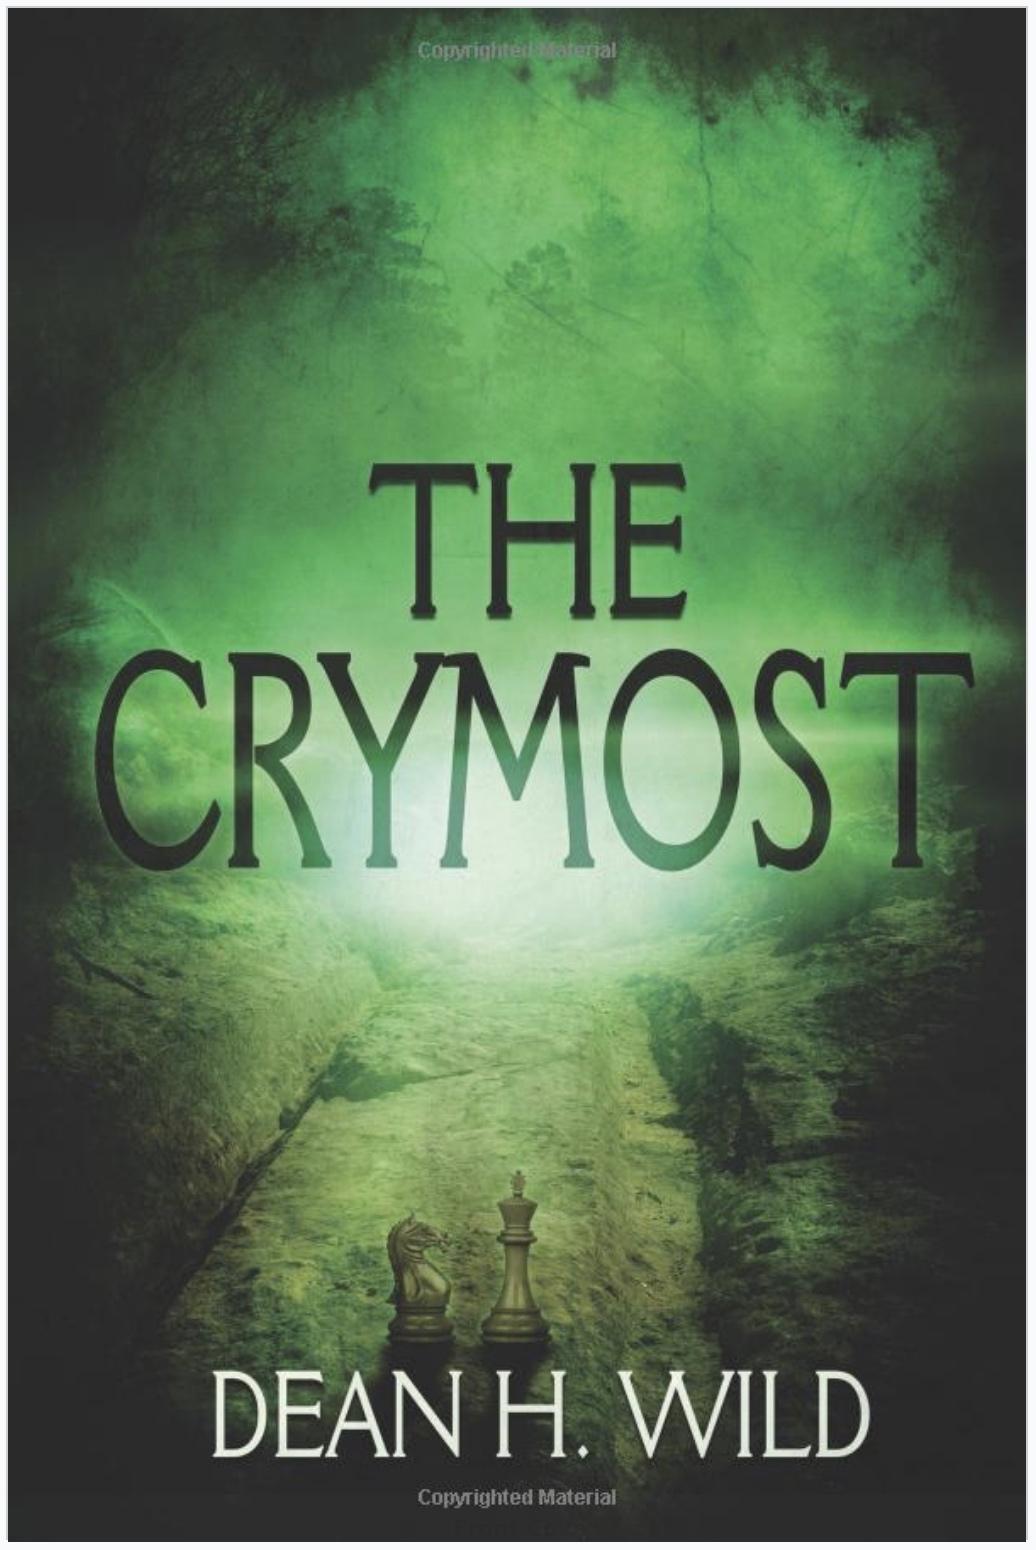 Crymost1.jpg